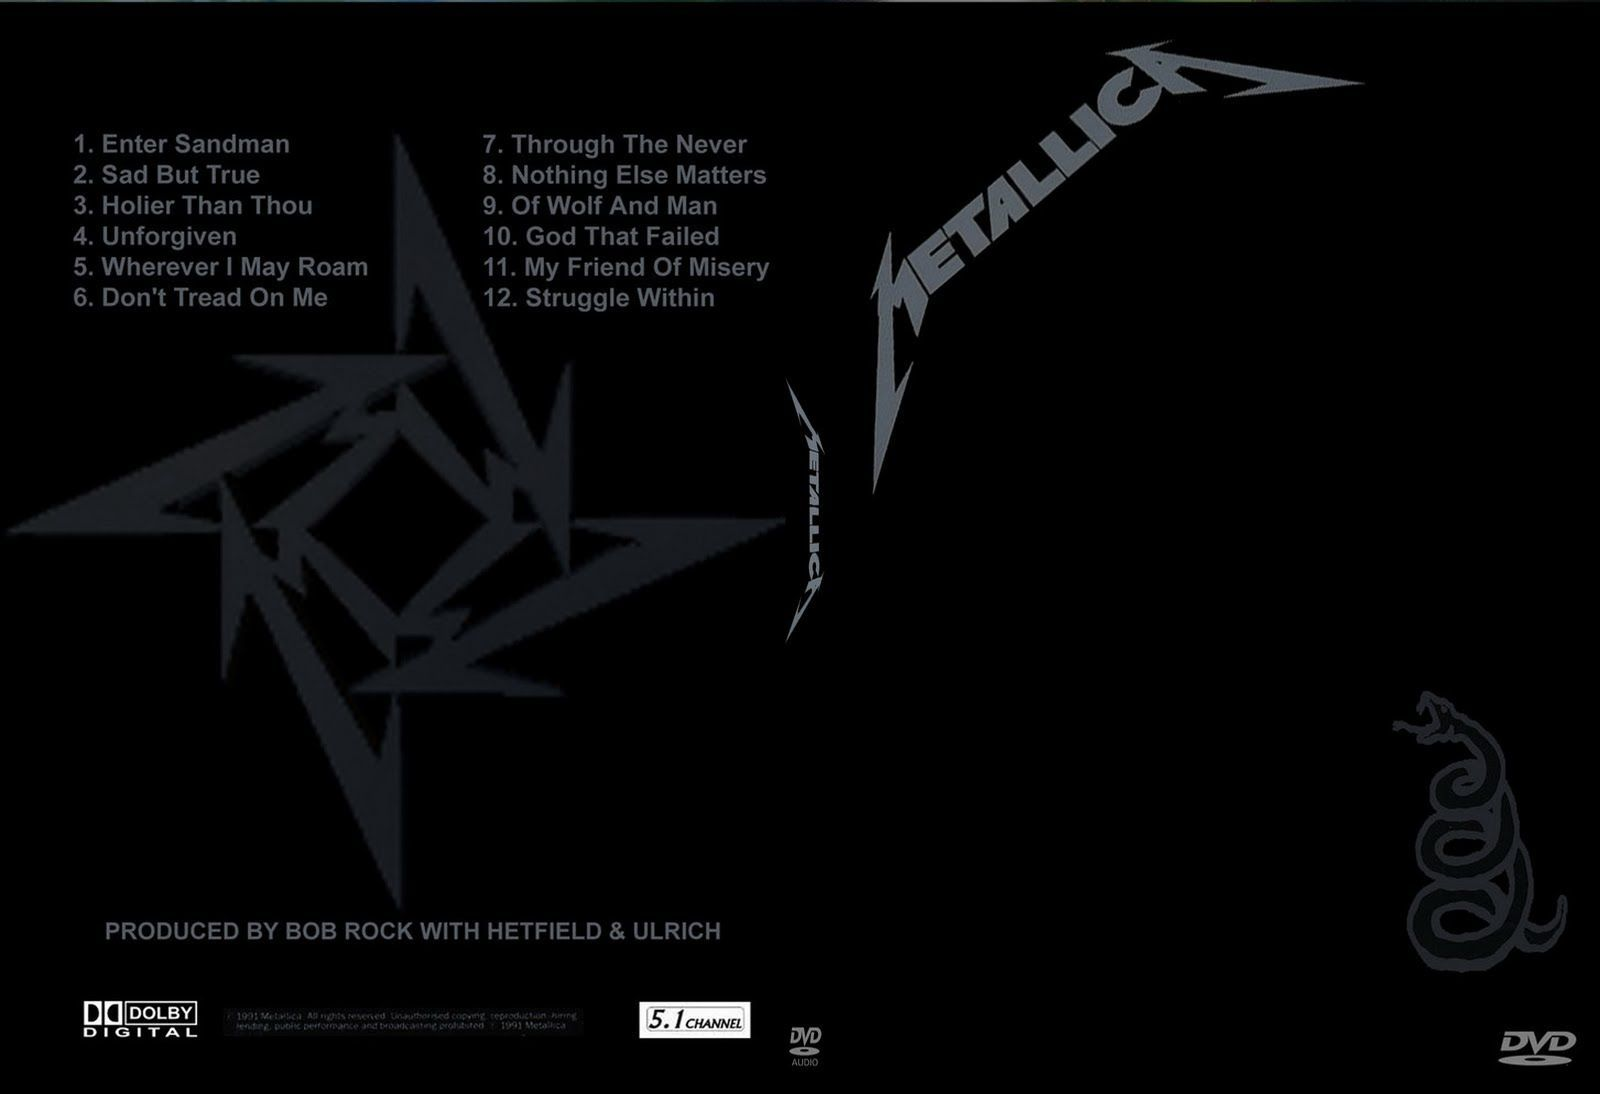 Free Download Metallica Black Album Wallpaper 1600x1094 For Your Desktop Mobile Tablet Explore 78 Metallica Black Album Wallpaper James Hetfield Wallpaper Metallica Logo Wallpaper Metallica Wallpapers Hd